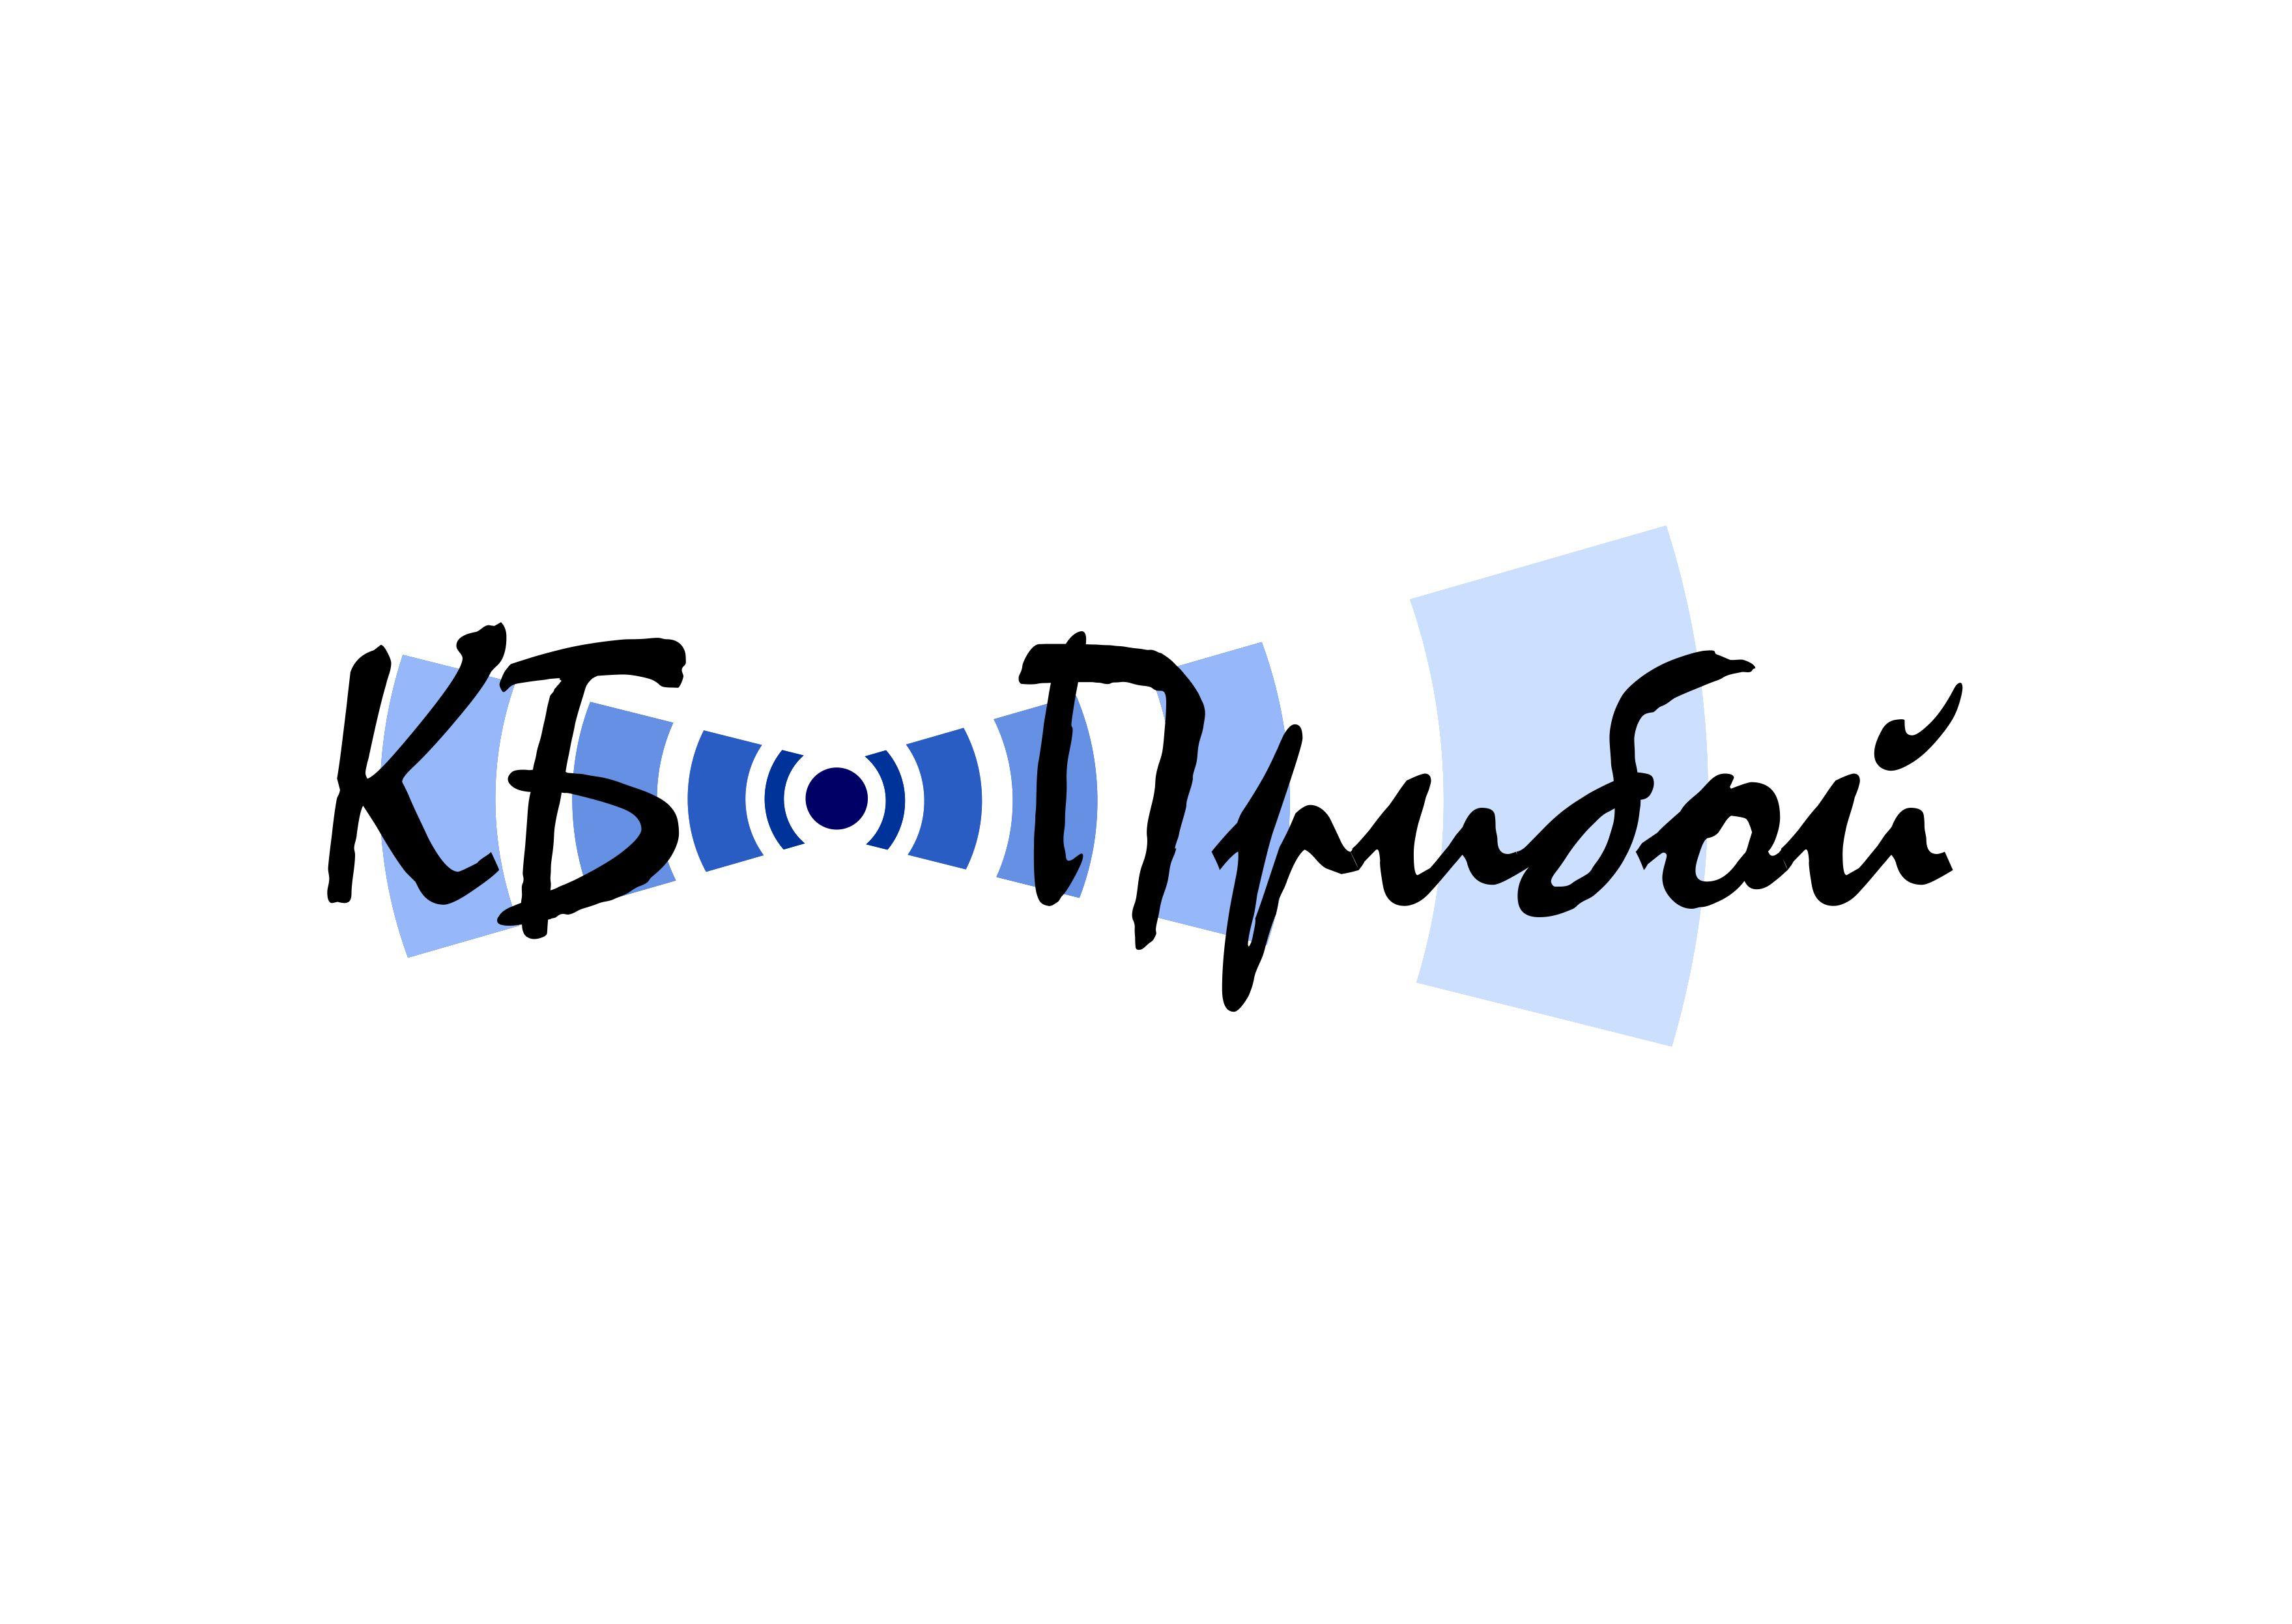 Разработка логотипа и фирменного стиля для КБ Прибой фото f_6325b2387ba623a2.jpg